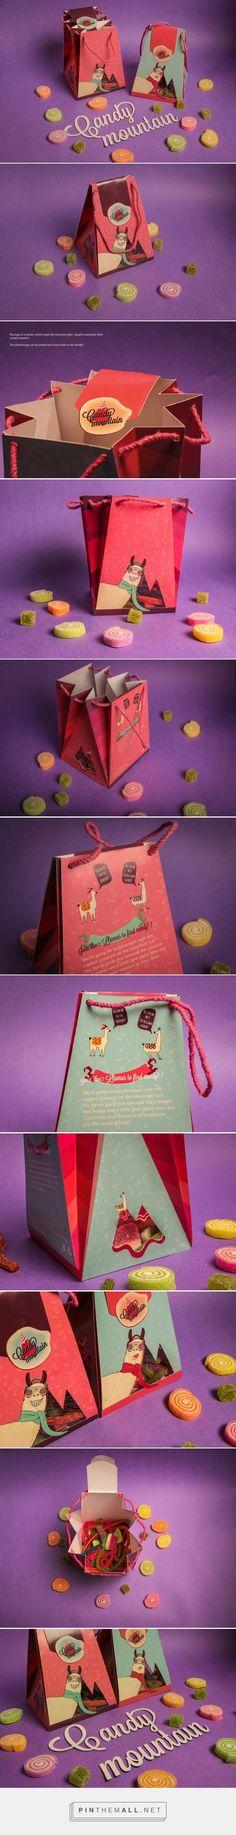 Candy Mountain Packaging by Avishya Shetty, Zena Corda: